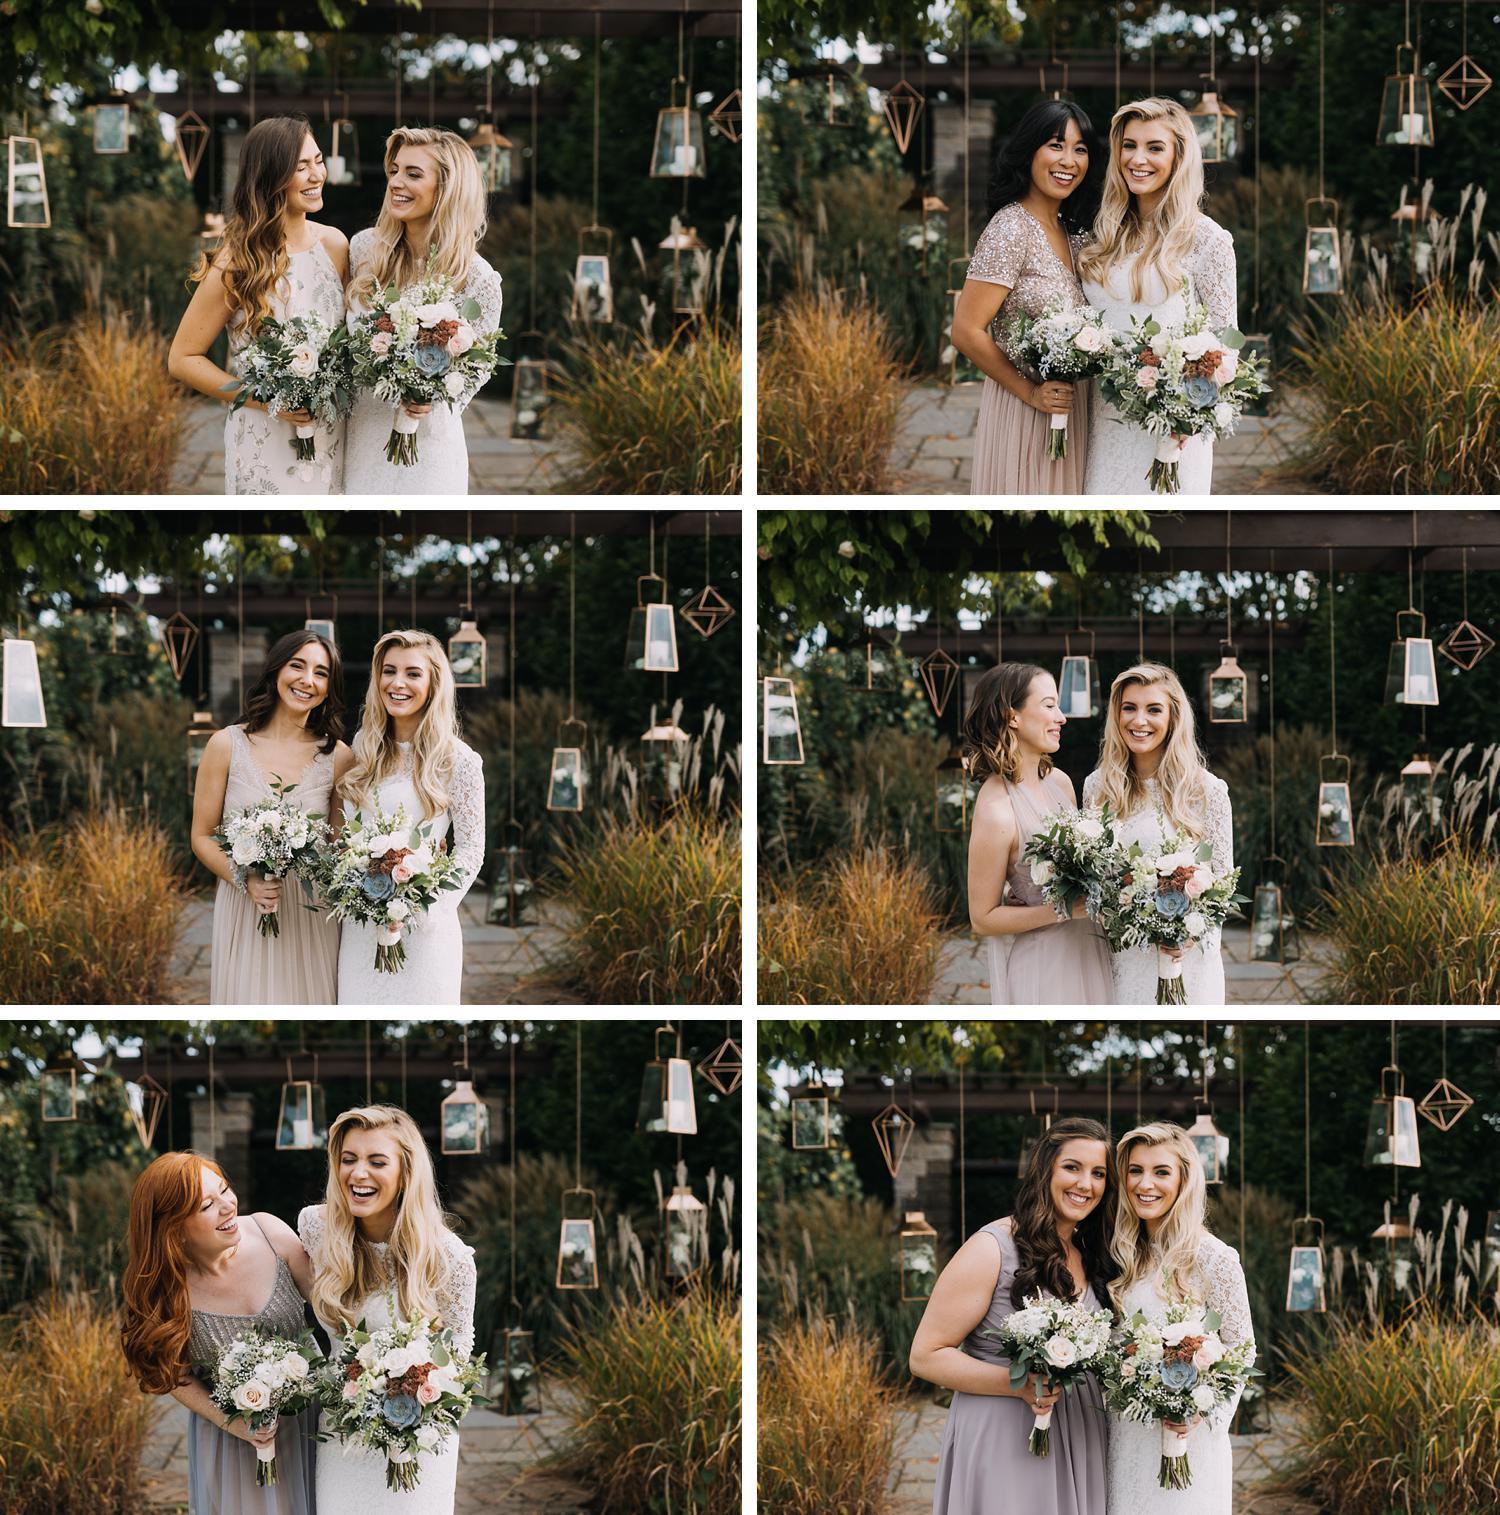 Conservatory Sussex County Fairgrounds Augusta NJ Wedding Photography Steph Massaro bridesmaids